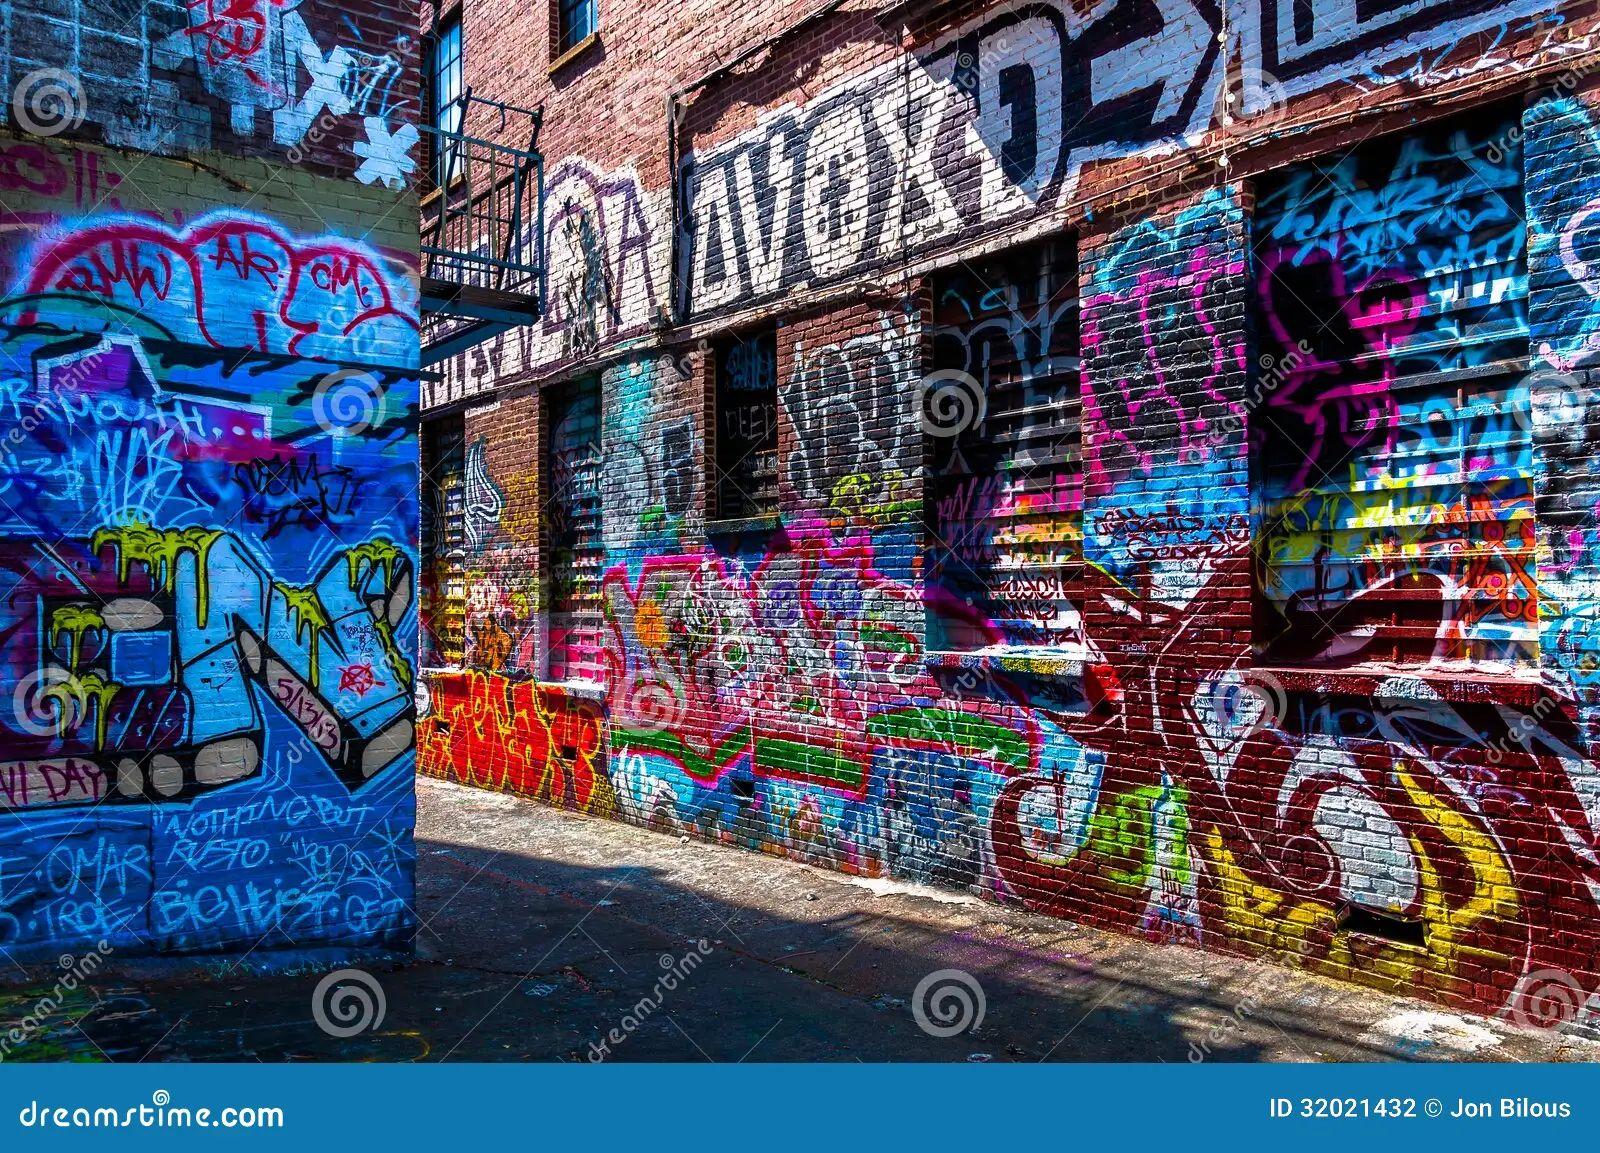 Alley baltimore graffiti walls